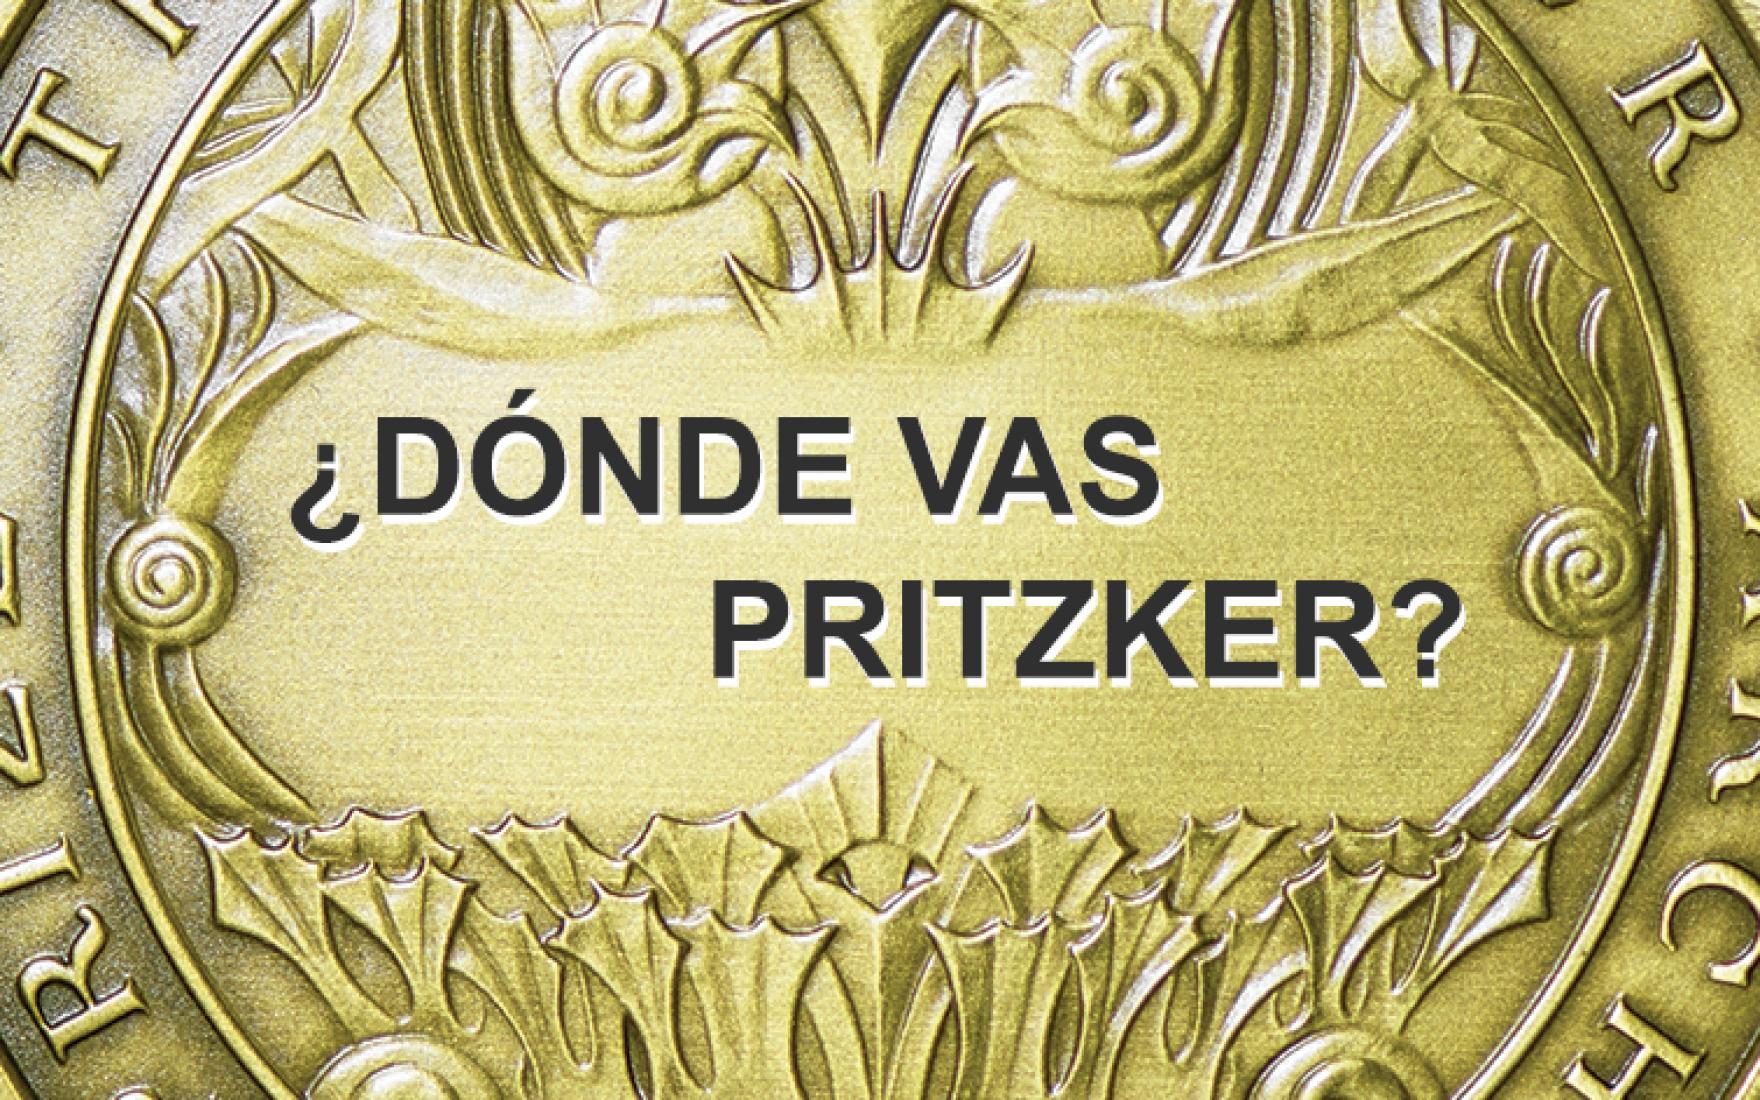 ¿Dónde vas Pritzker?